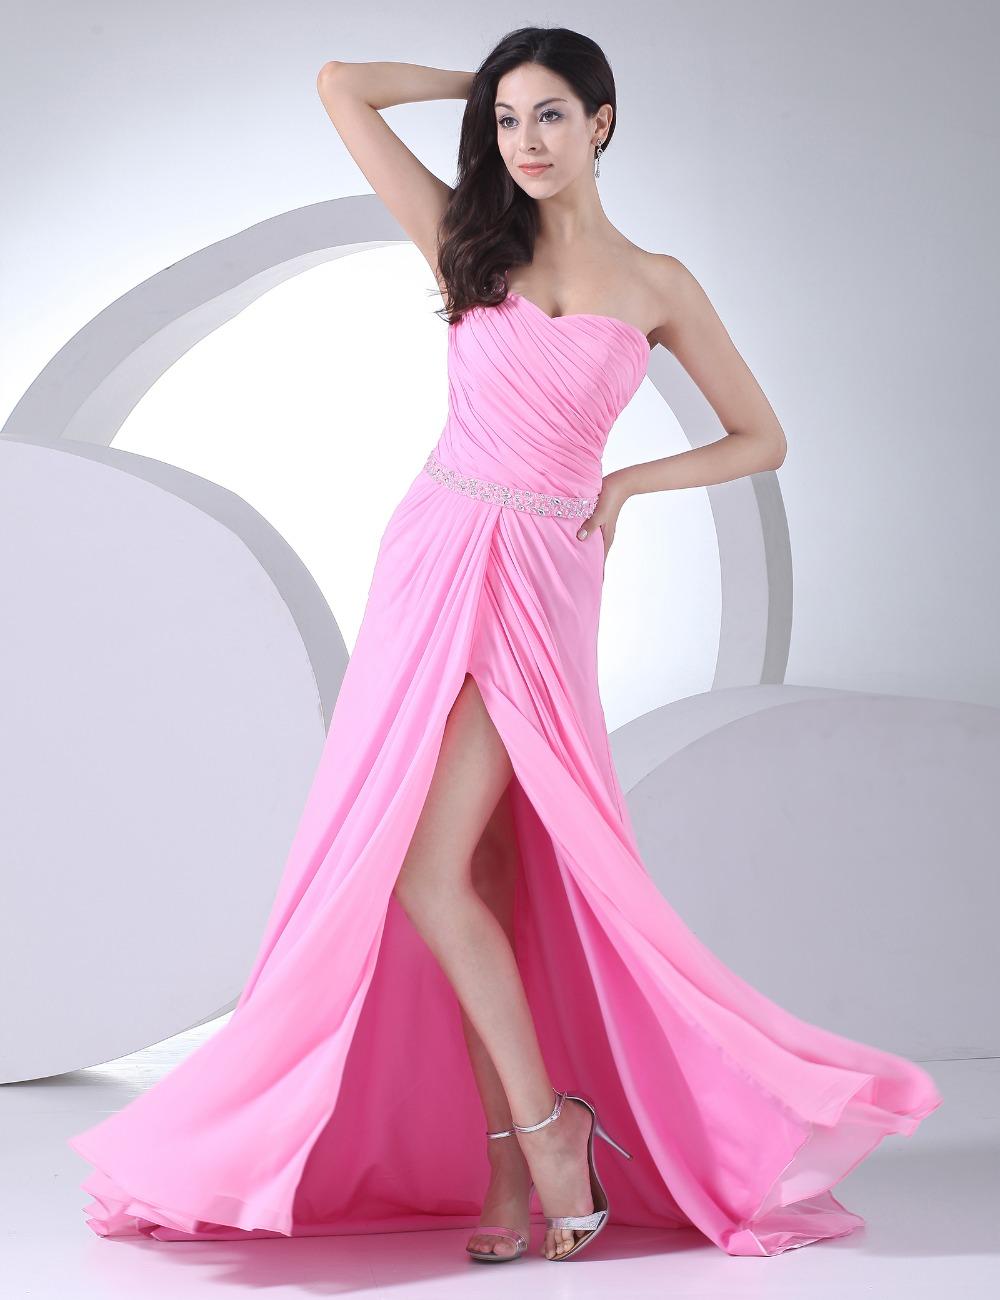 Don's Bridal 2016 Cotton Sweetheart Neck Sleeveless Straight Plus Size Elegant Long Cheap Sexy Vintage Homecoming Dresses(China (Mainland))